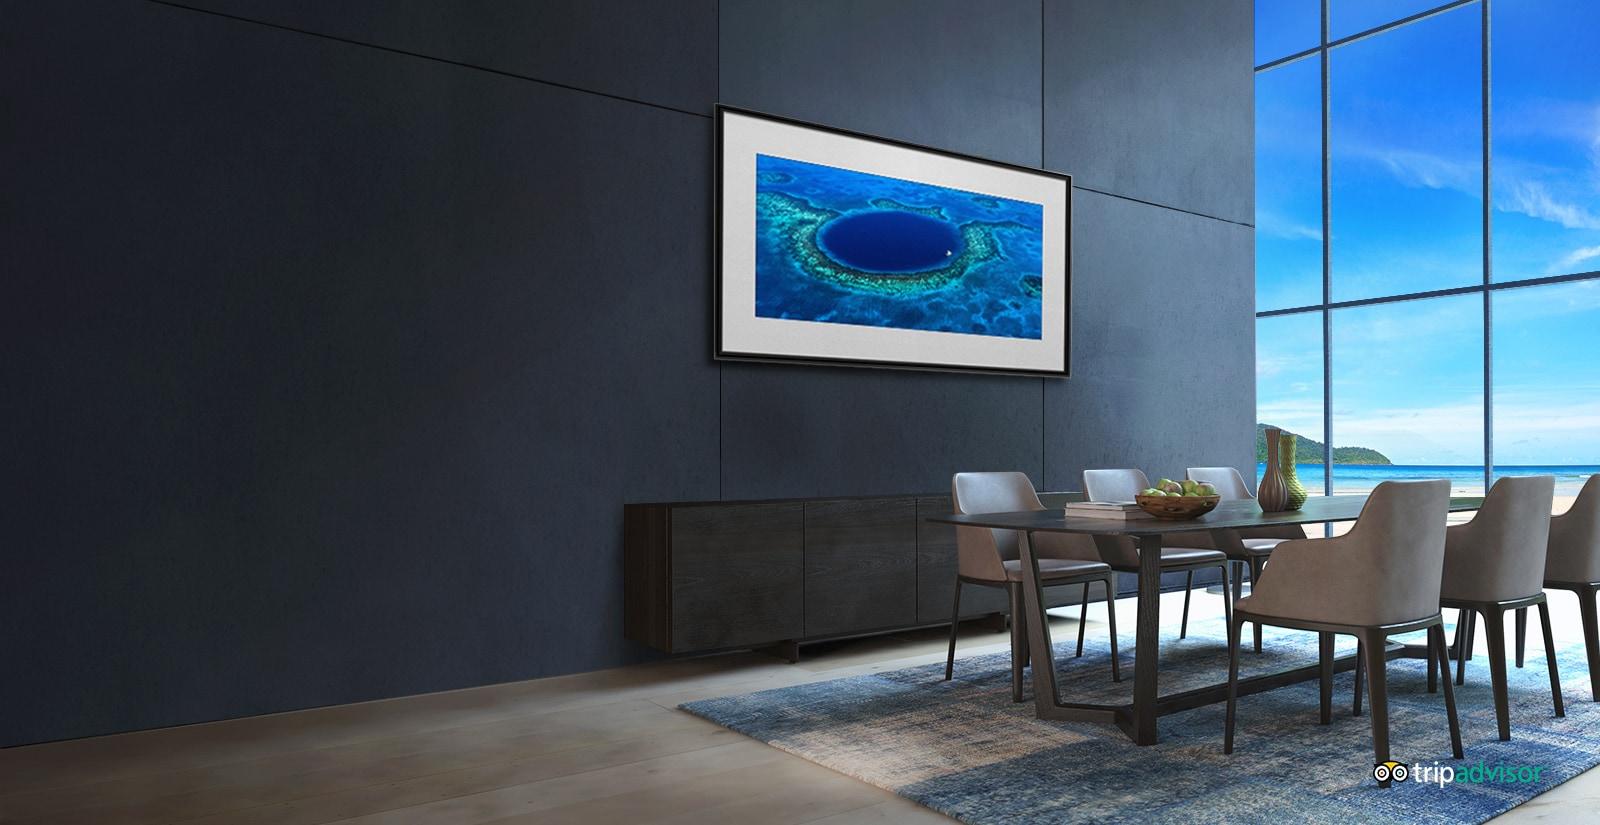 OLED TV ด้วยโหมดแกลเลอรี